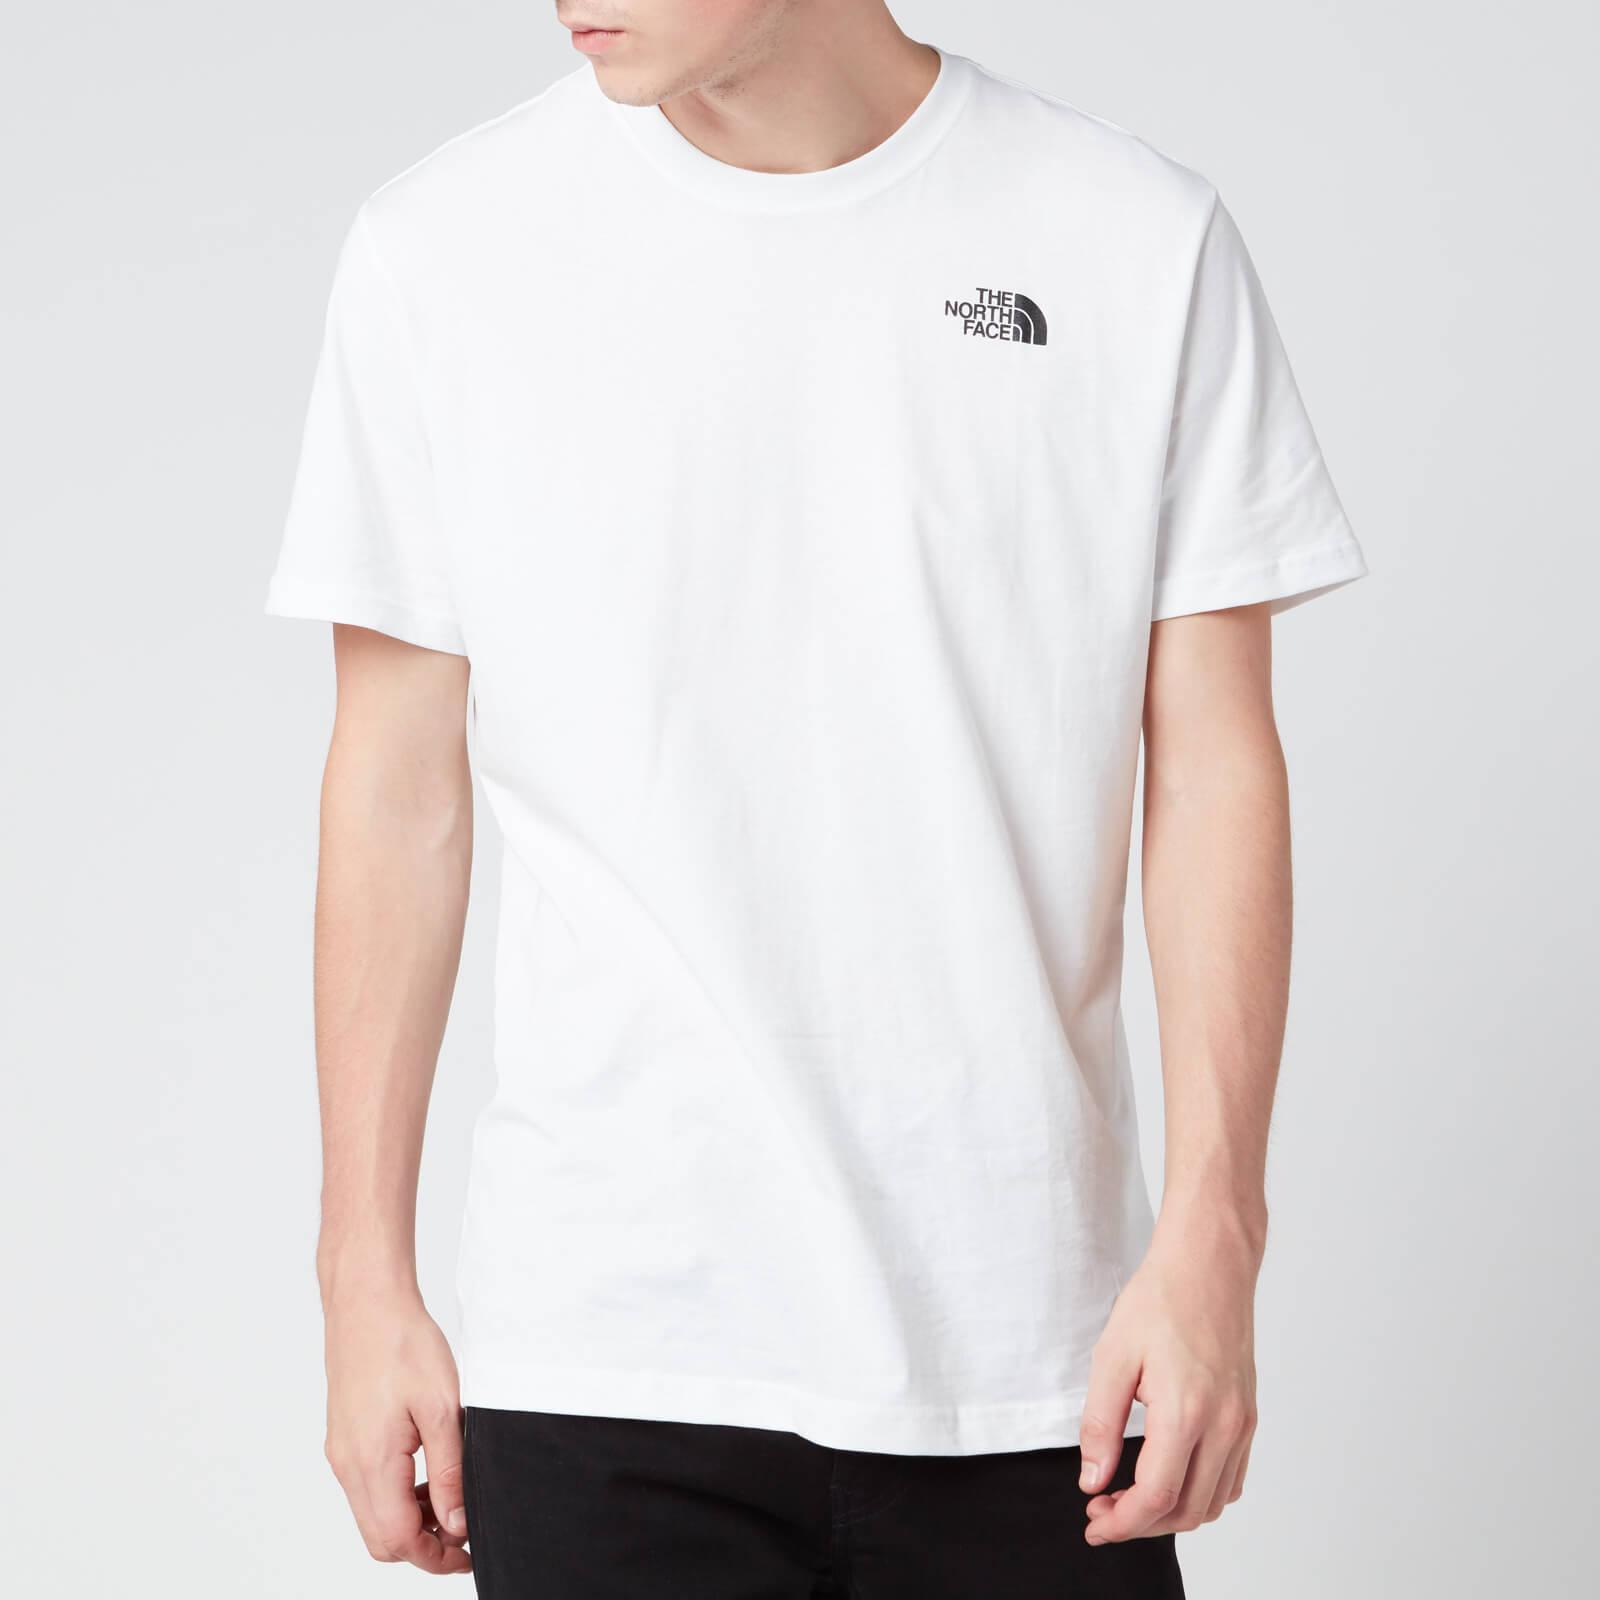 The North Face Men's Redbox Celebration Short Sleeve T-Shirt - TNF White